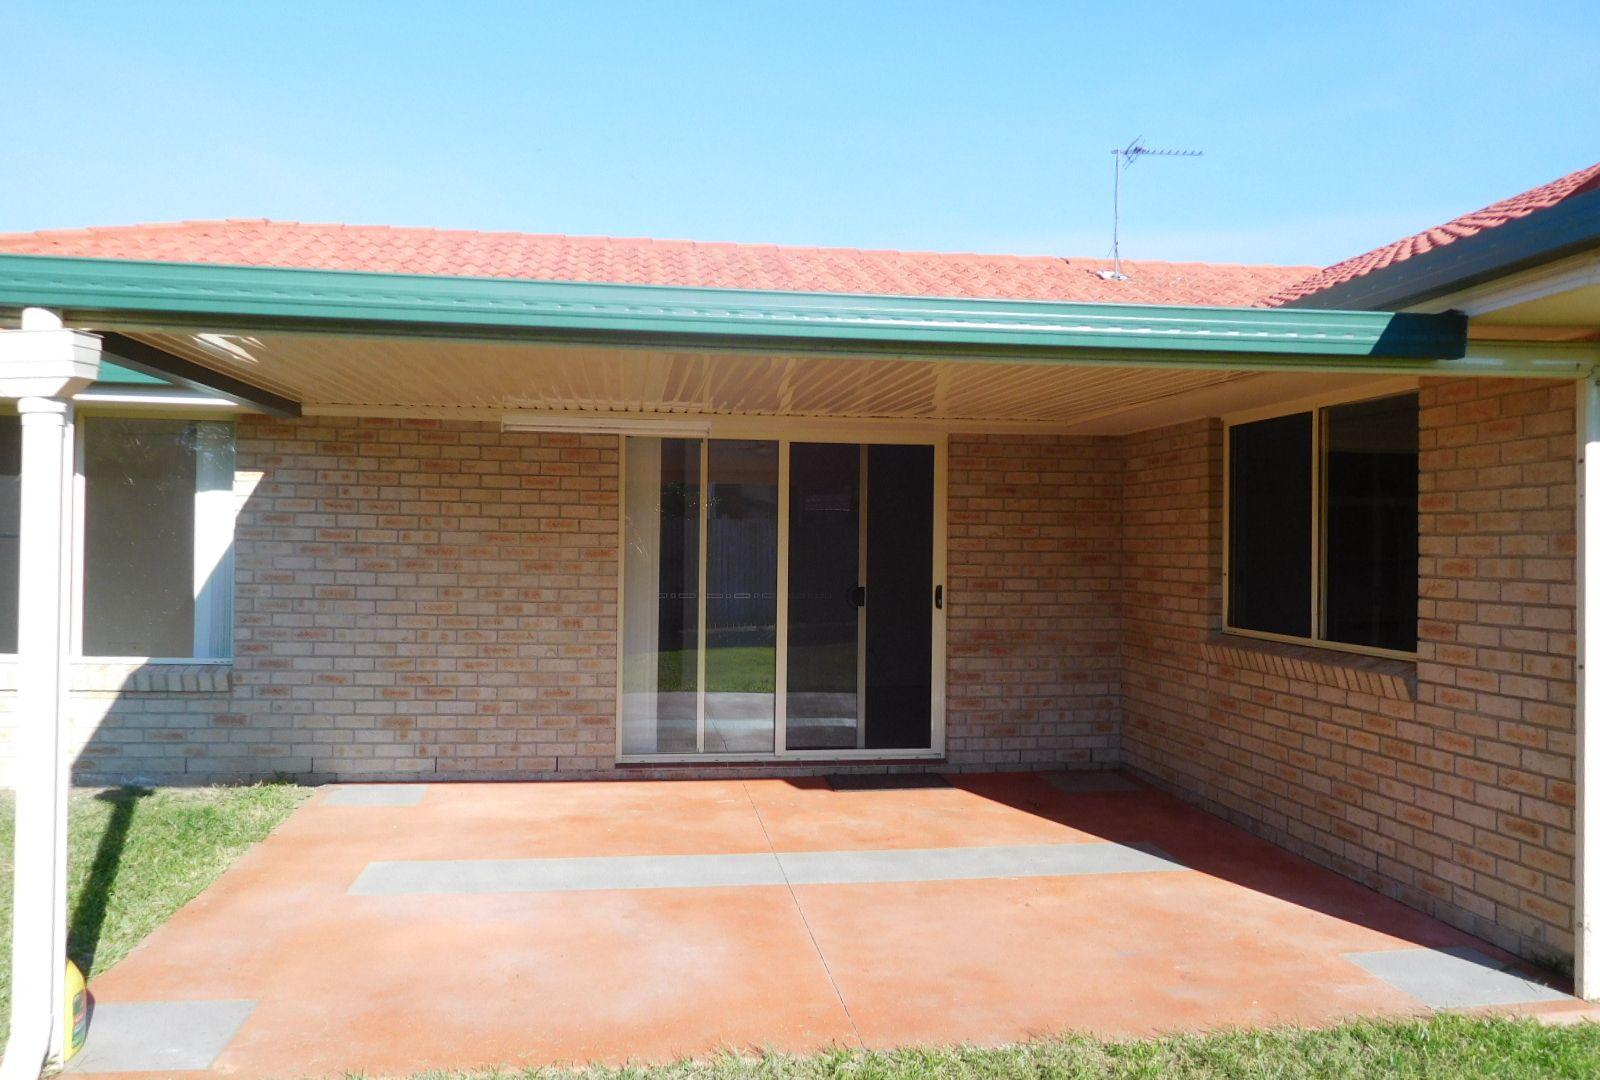 14 Bianca Court, Torquay QLD 4655, Image 11